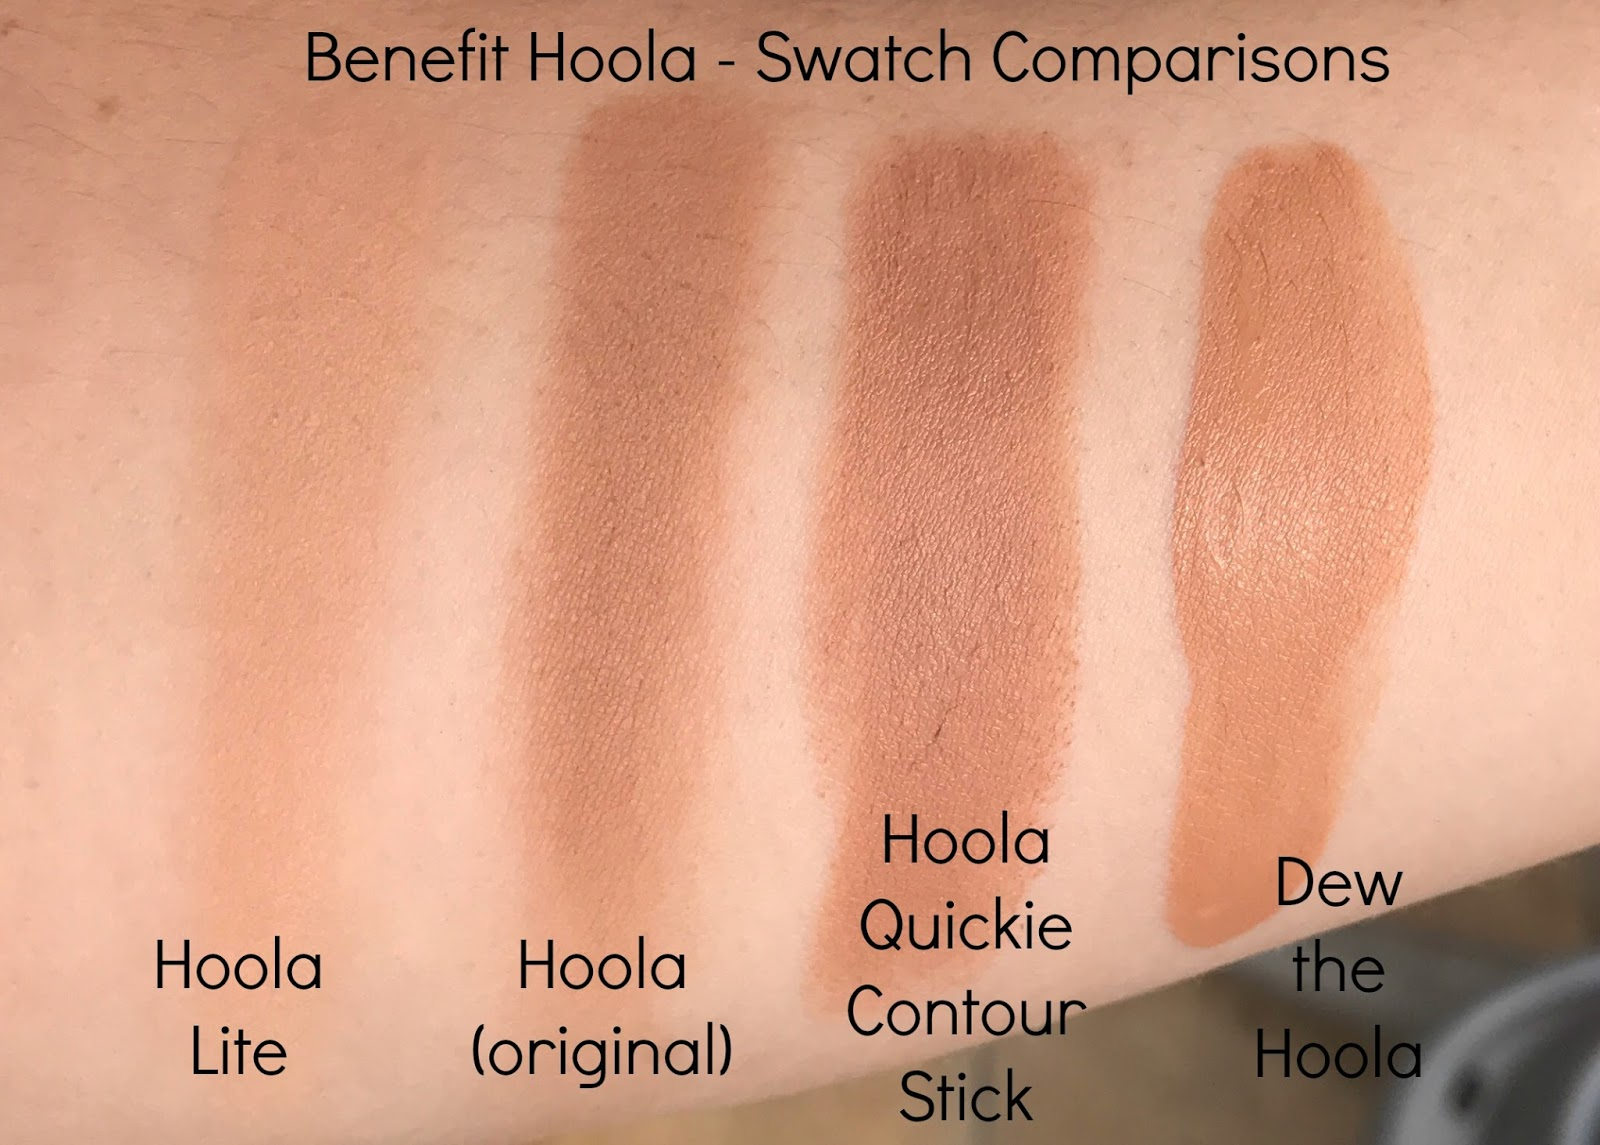 Hoola Quickie Contour Stick by Benefit #3